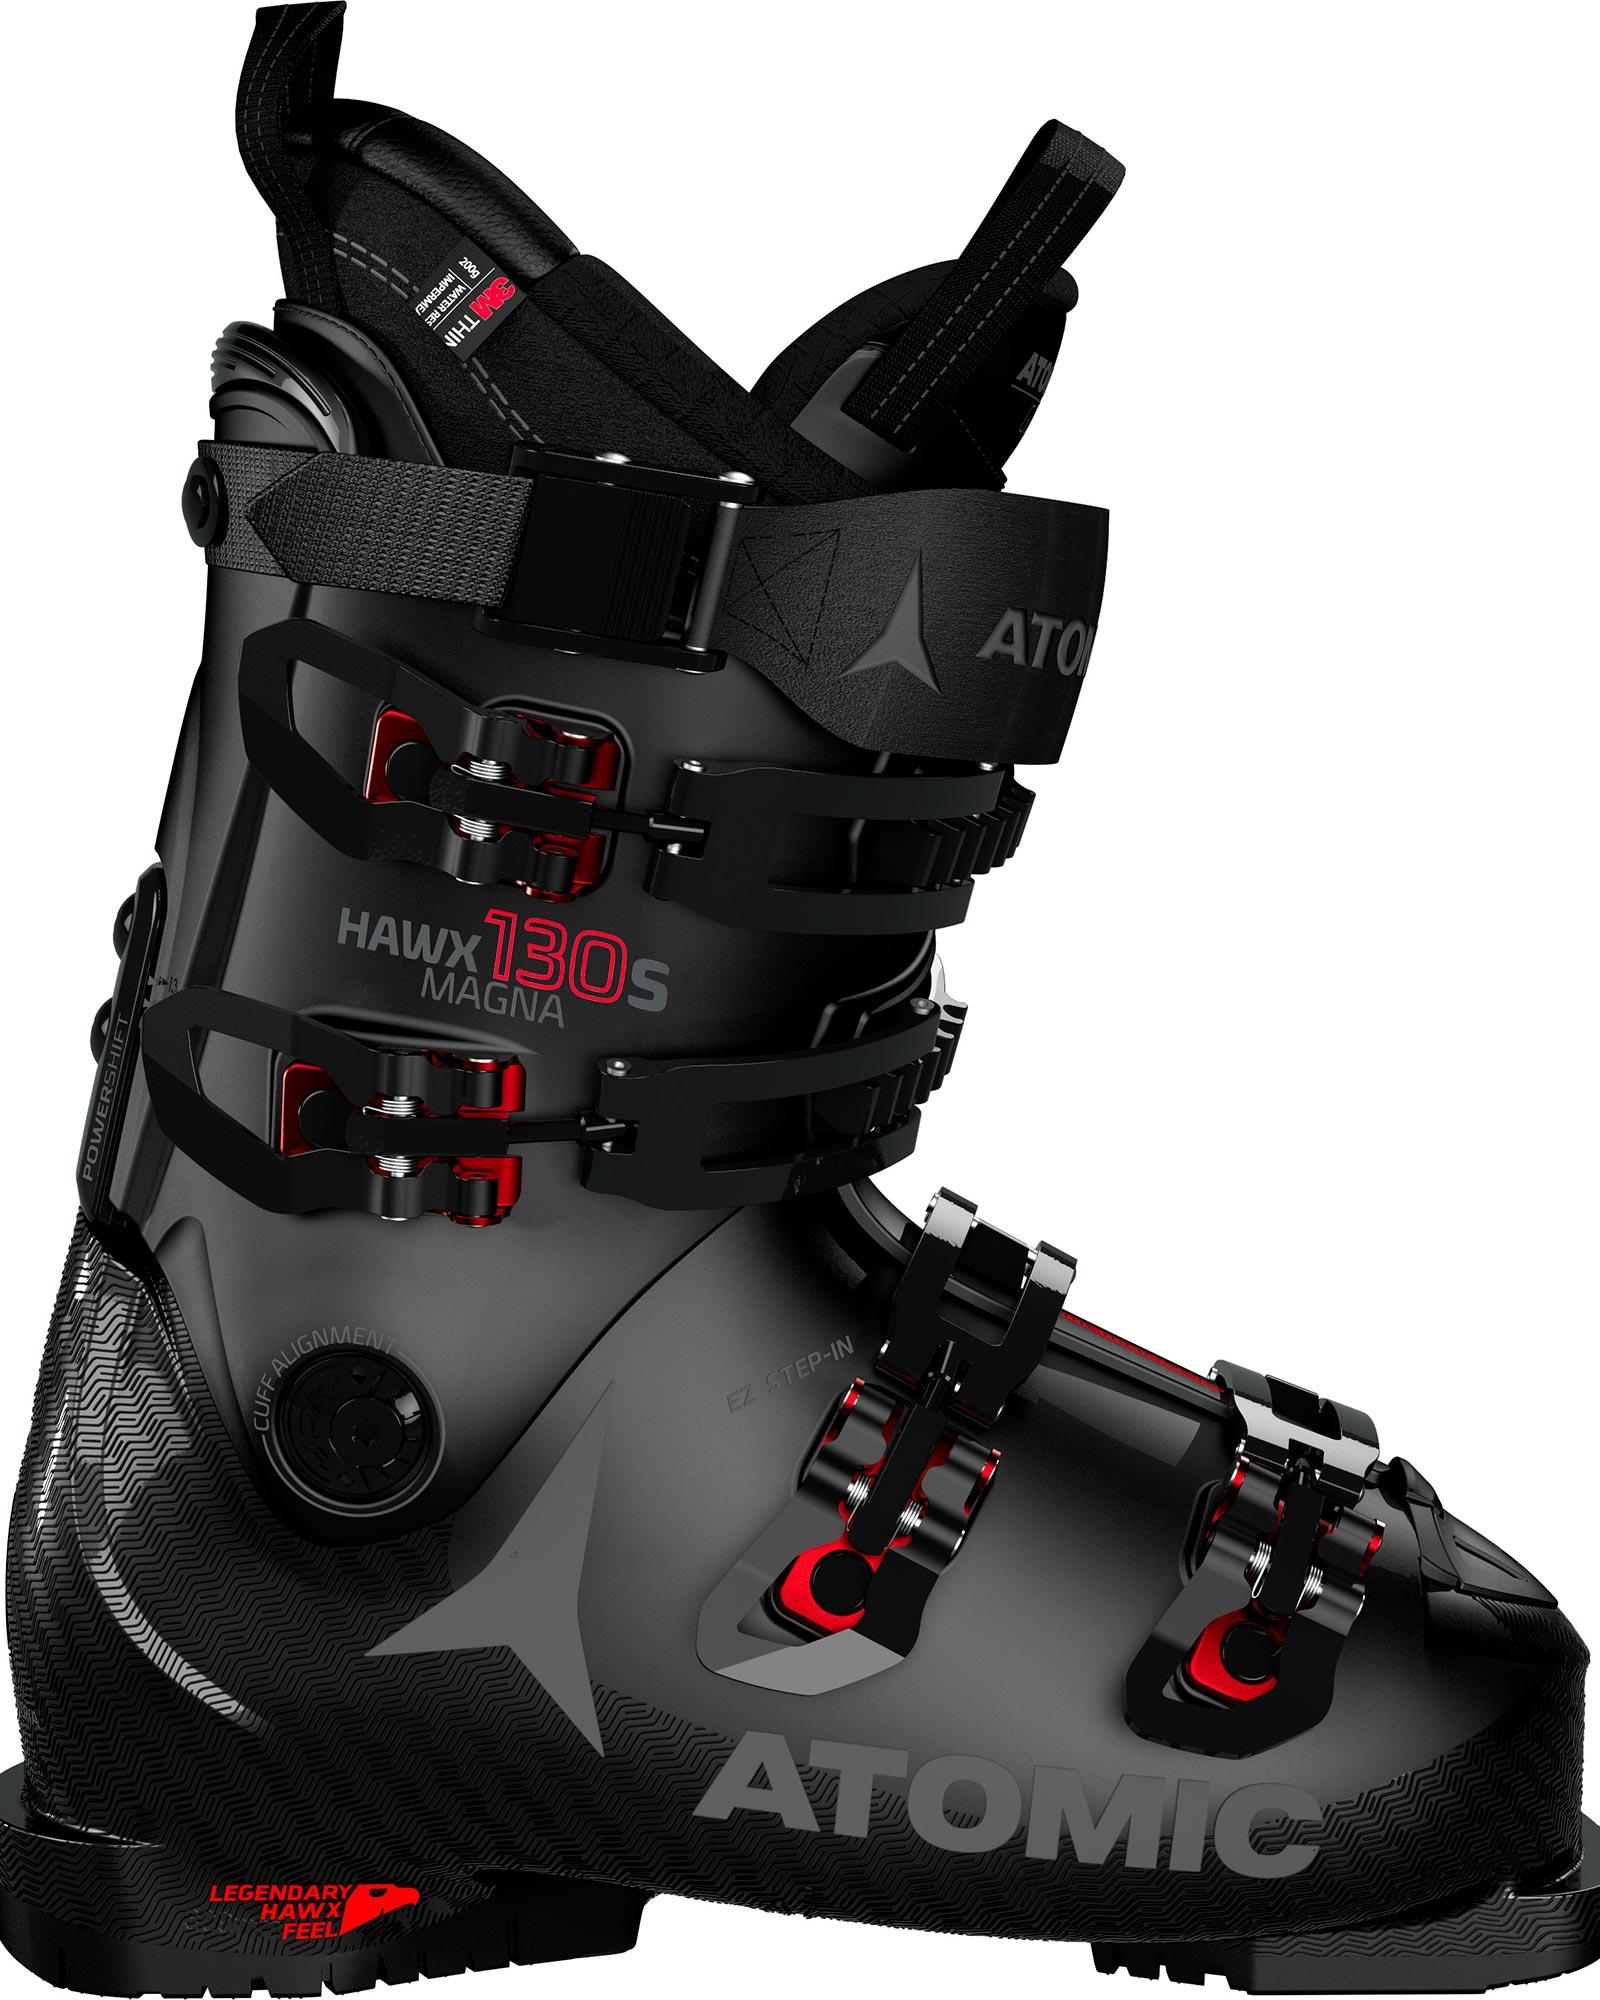 Atomic Men's Hawx Magna 130 Ski Boots 2020 / 2021 0